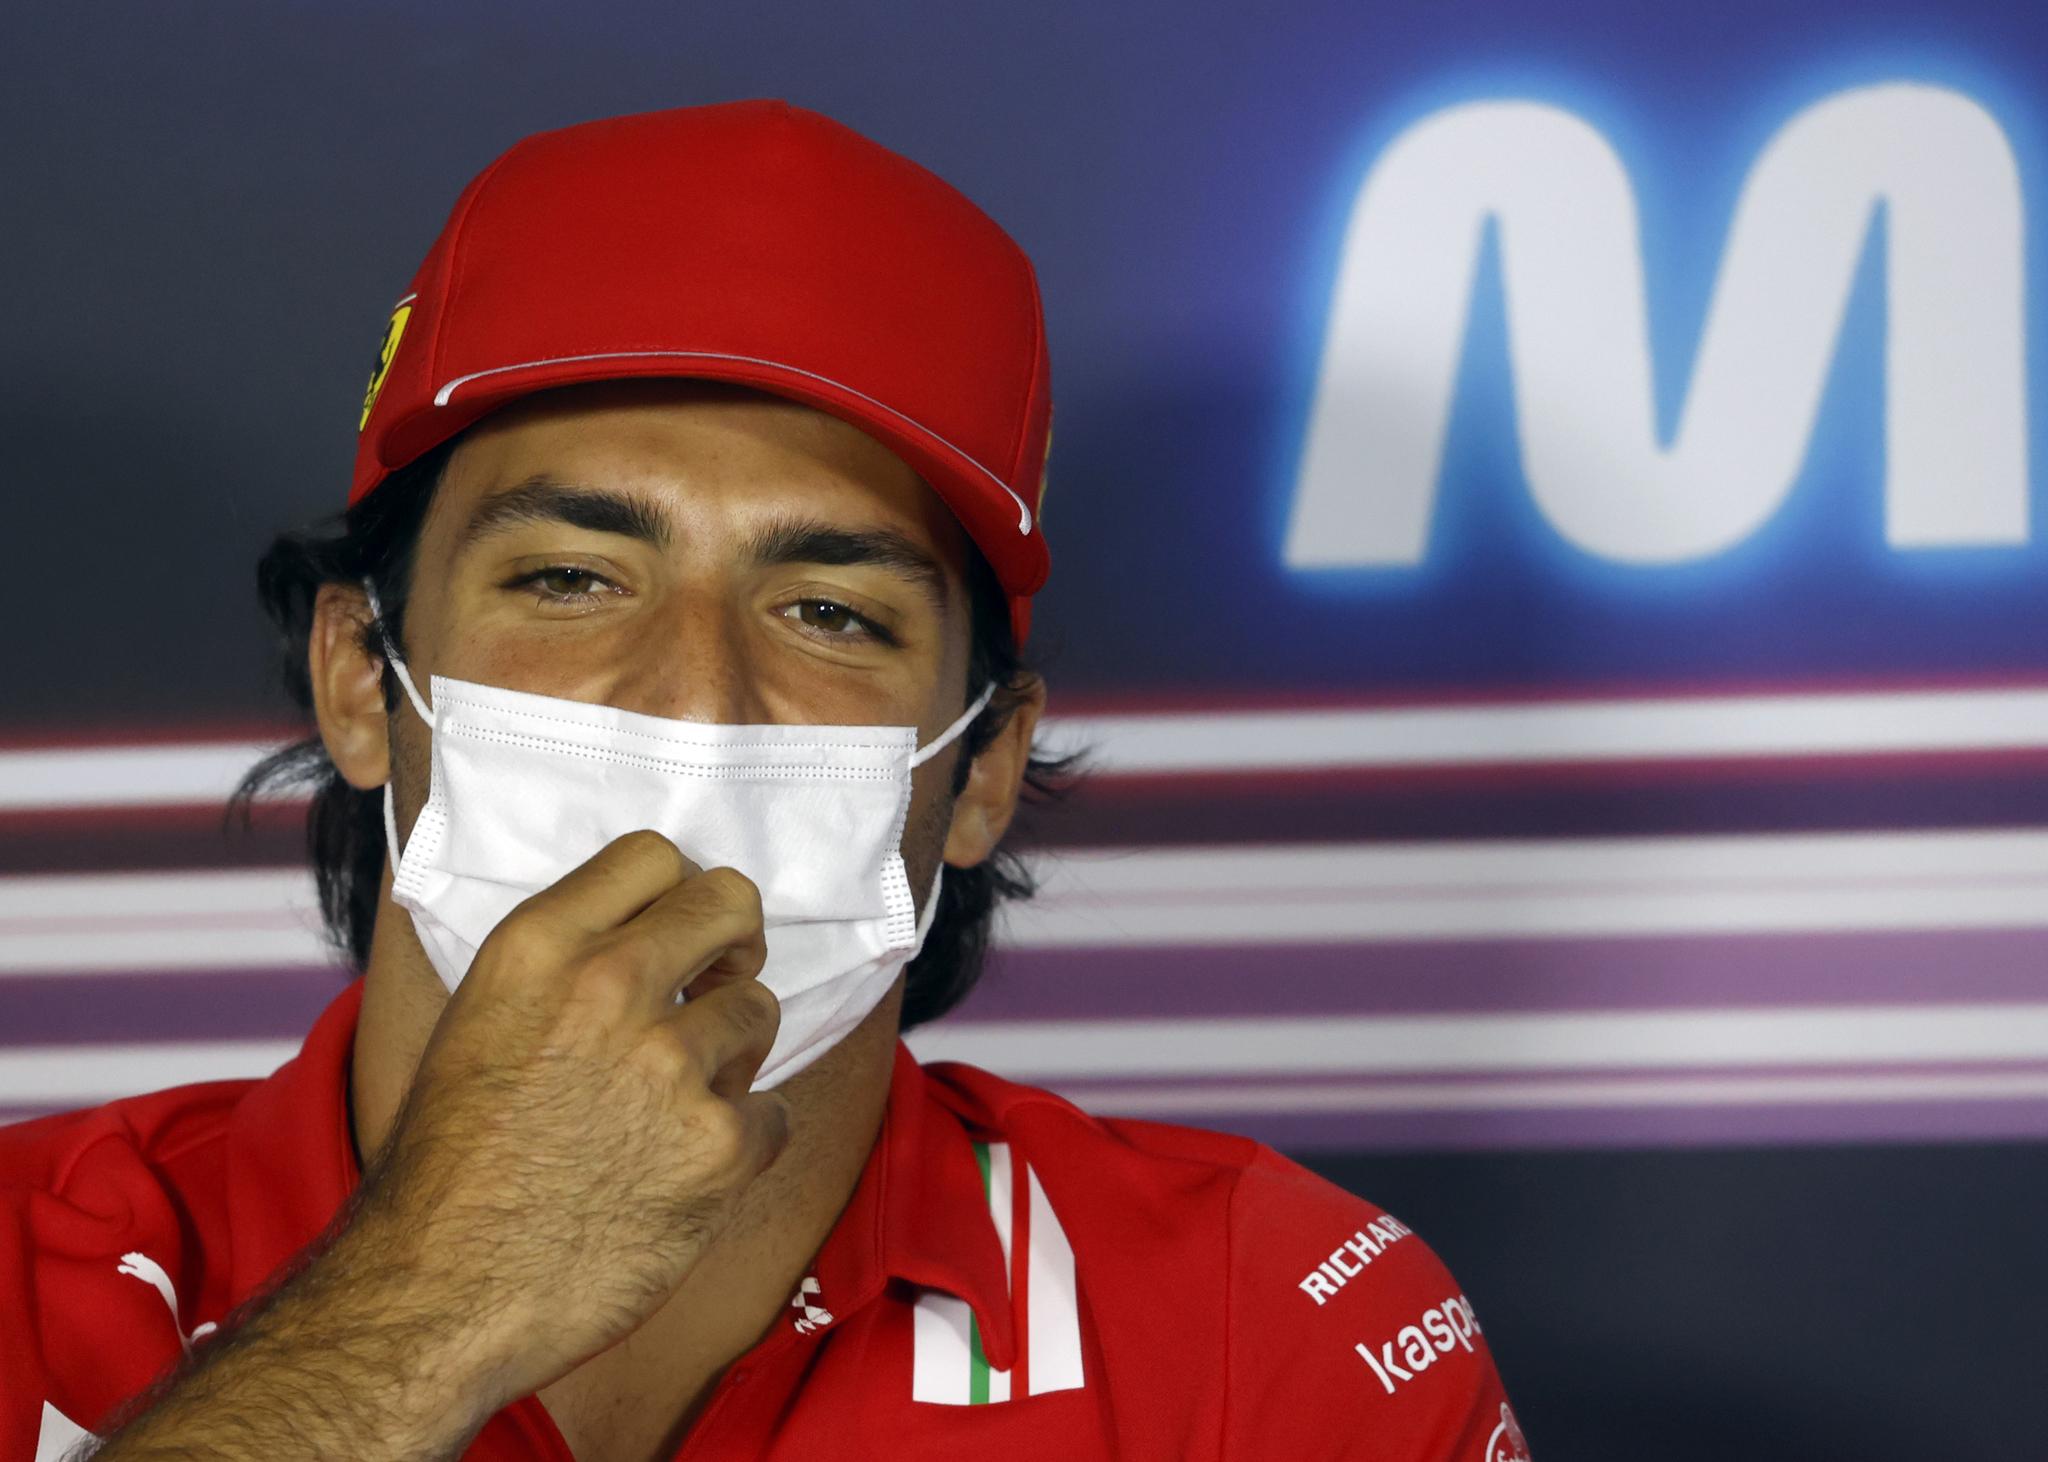 Carlos Sainz afirma que la lucha entre Mercedes y Red Bull no le hace mal a Ferrari